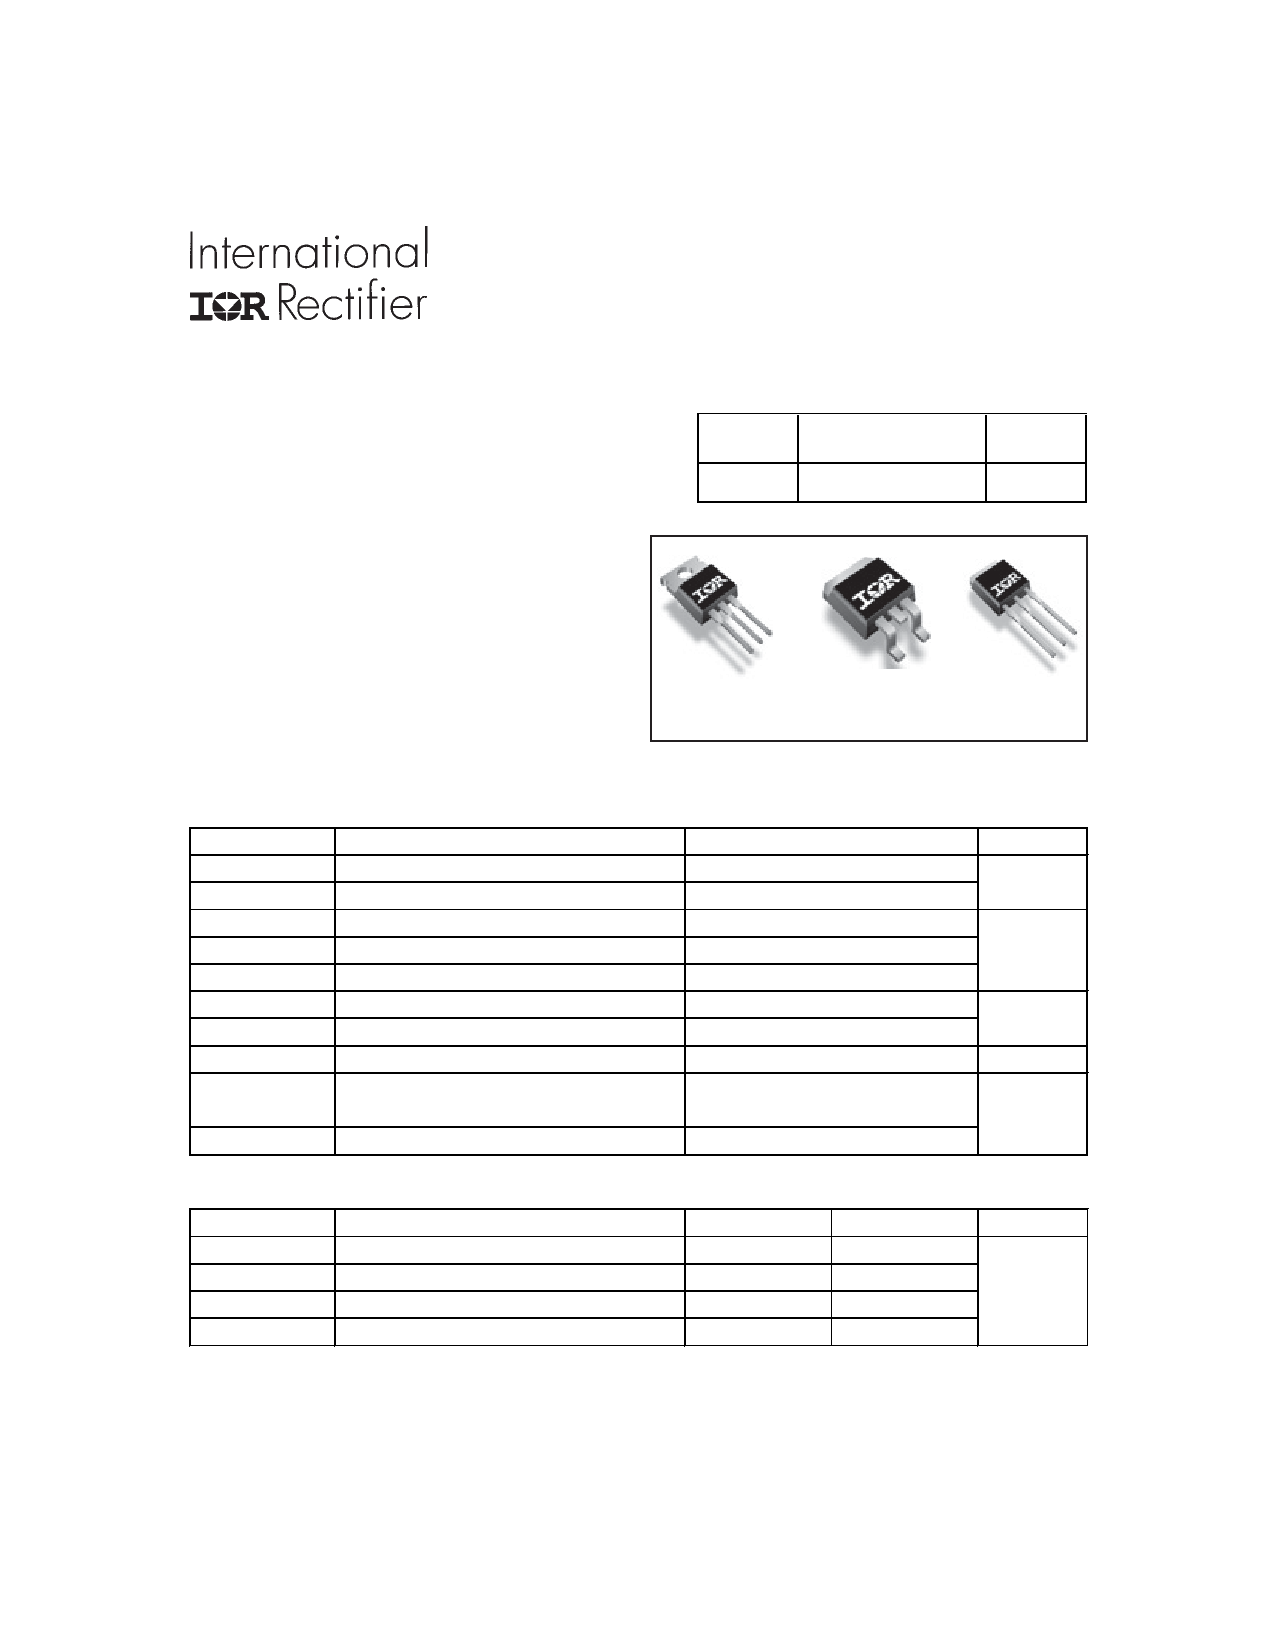 IRL3714ZS Datasheet, IRL3714ZS PDF,ピン配置, 機能